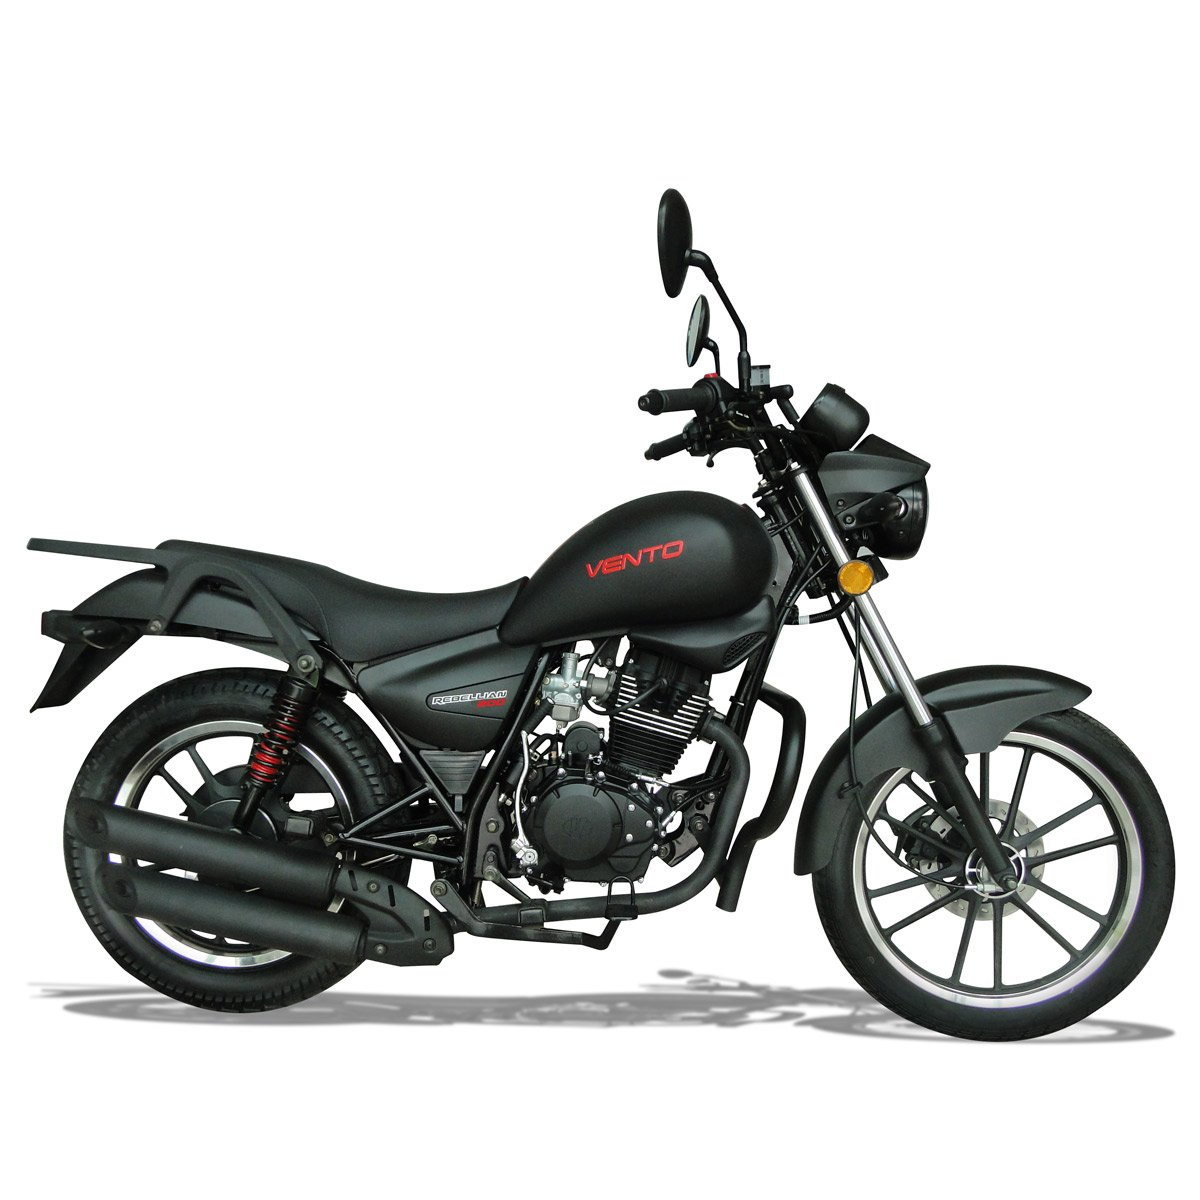 Motocicleta 200Cc Rebellian Ngr Mate 2017